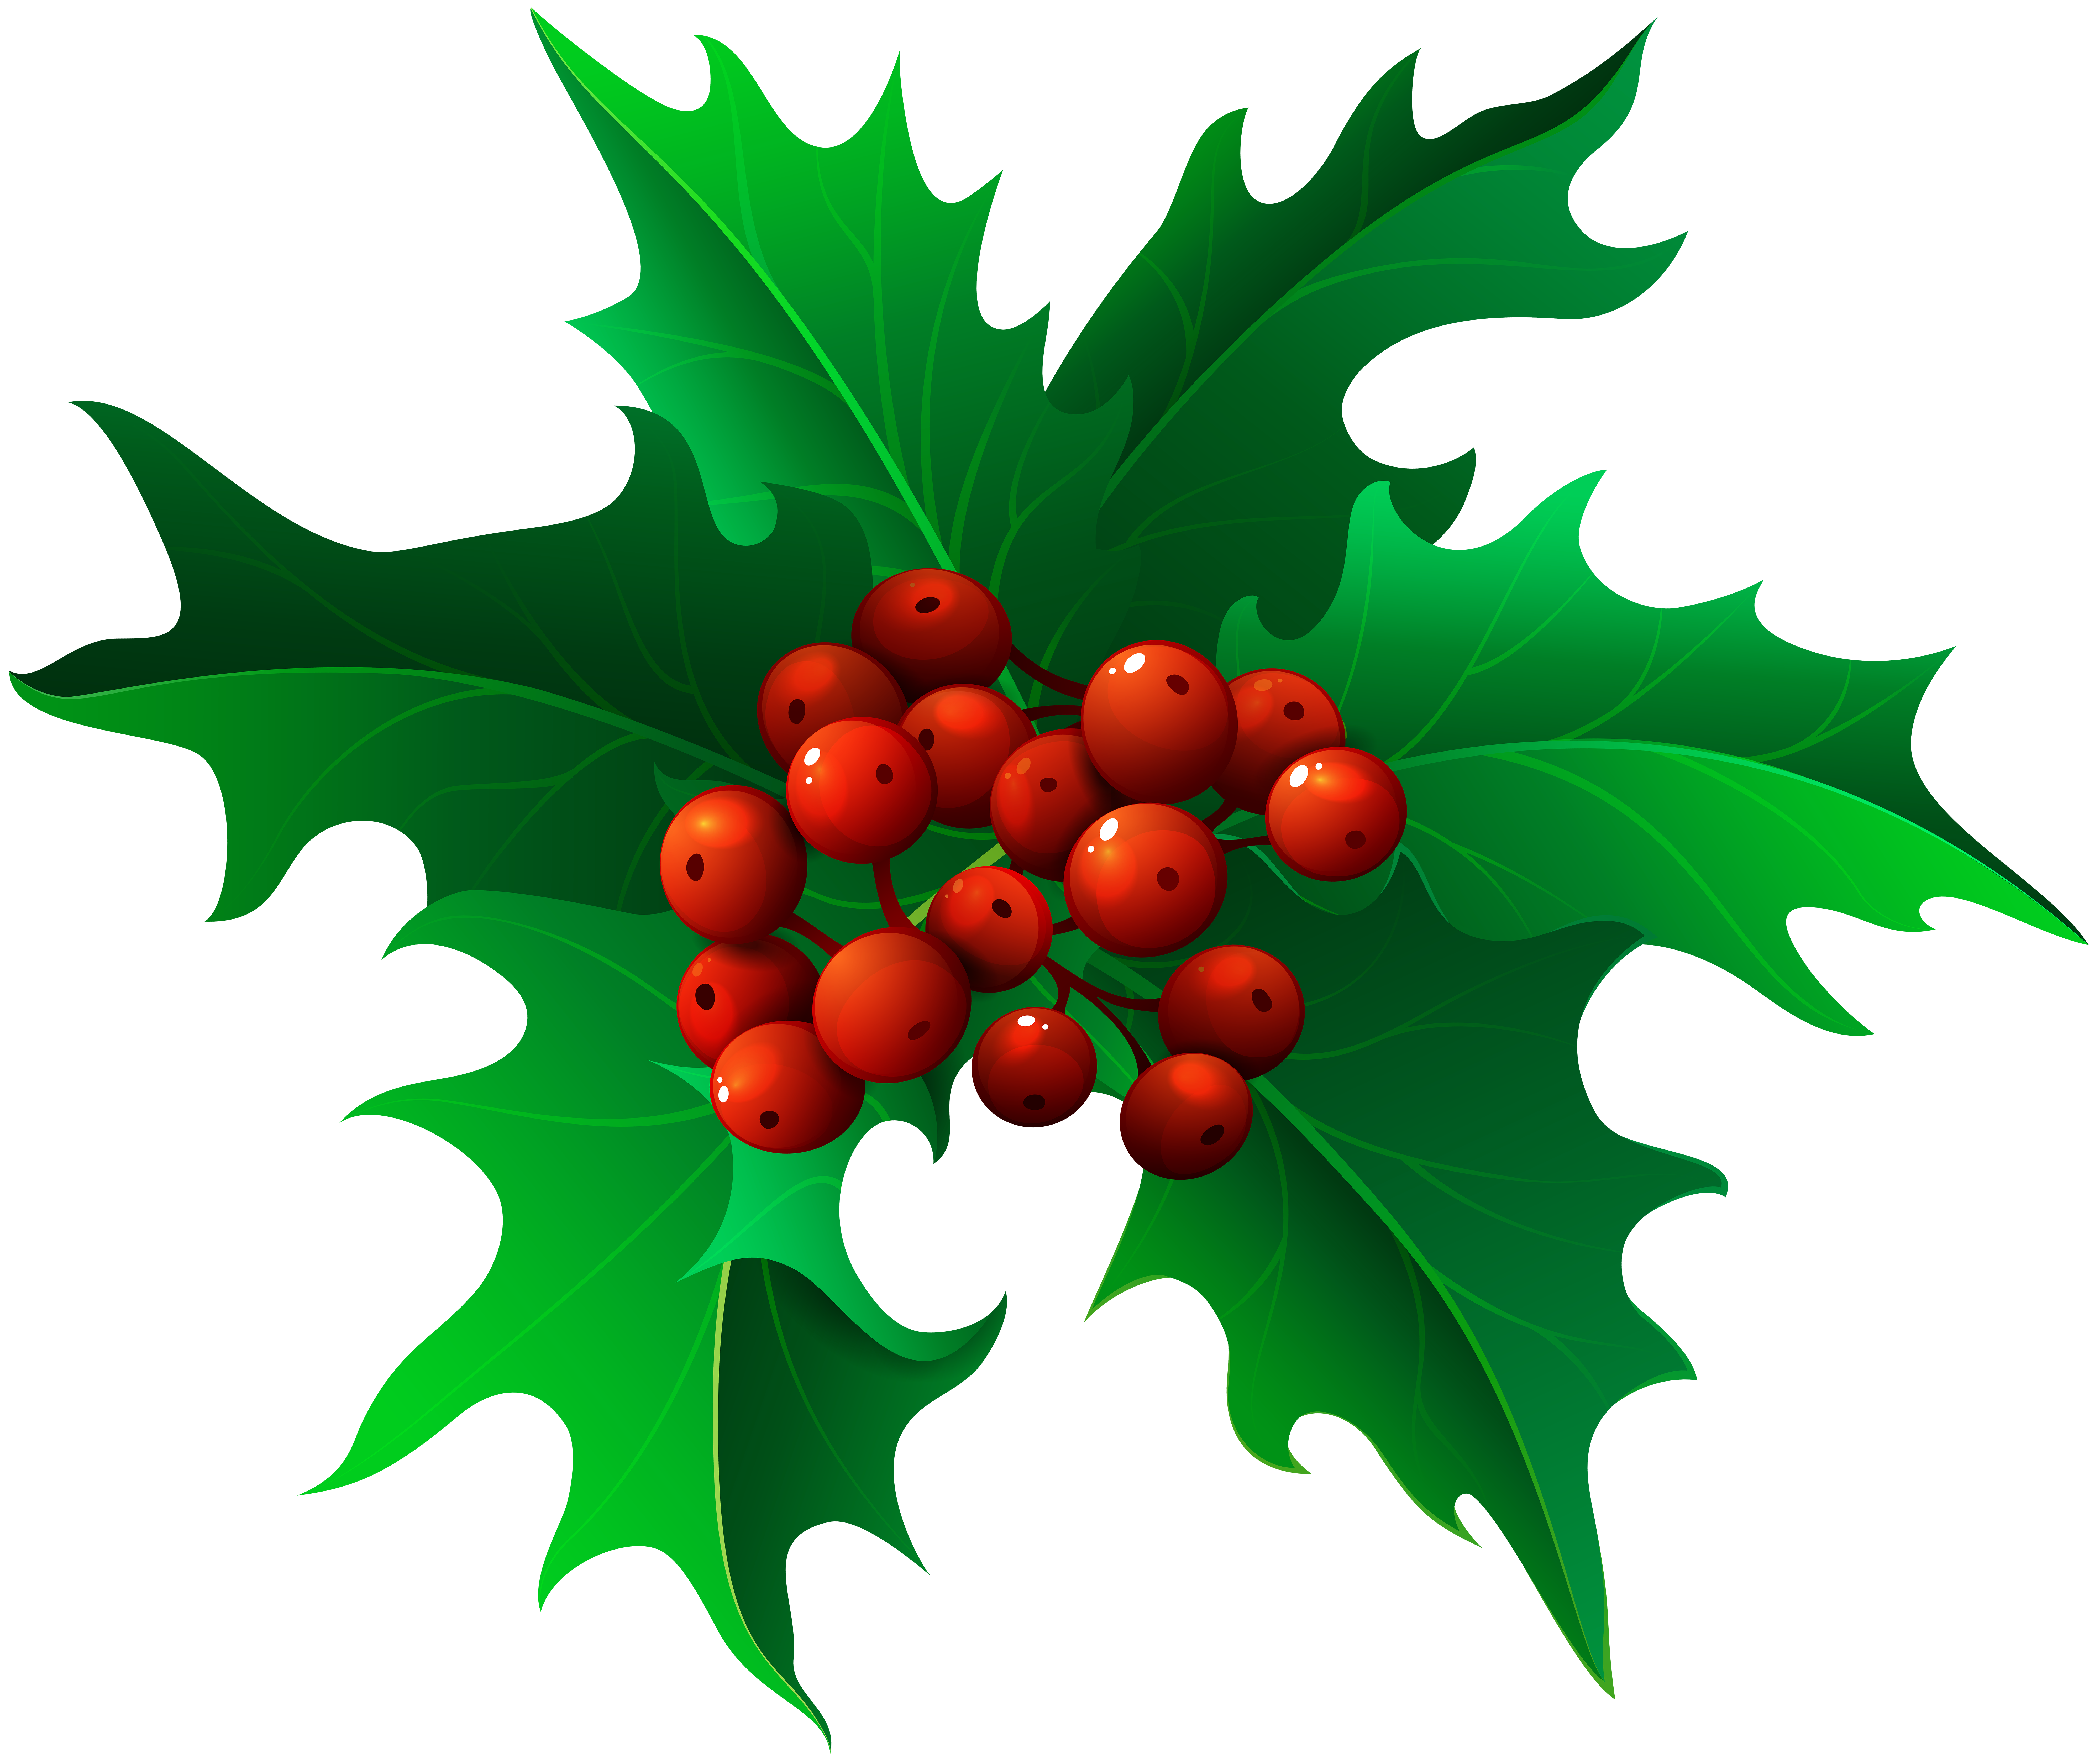 Holly tree clipart vector royalty free download Mistletoe Christmas Clip art - Christmas Holly Mistletoe Transparent ... vector royalty free download